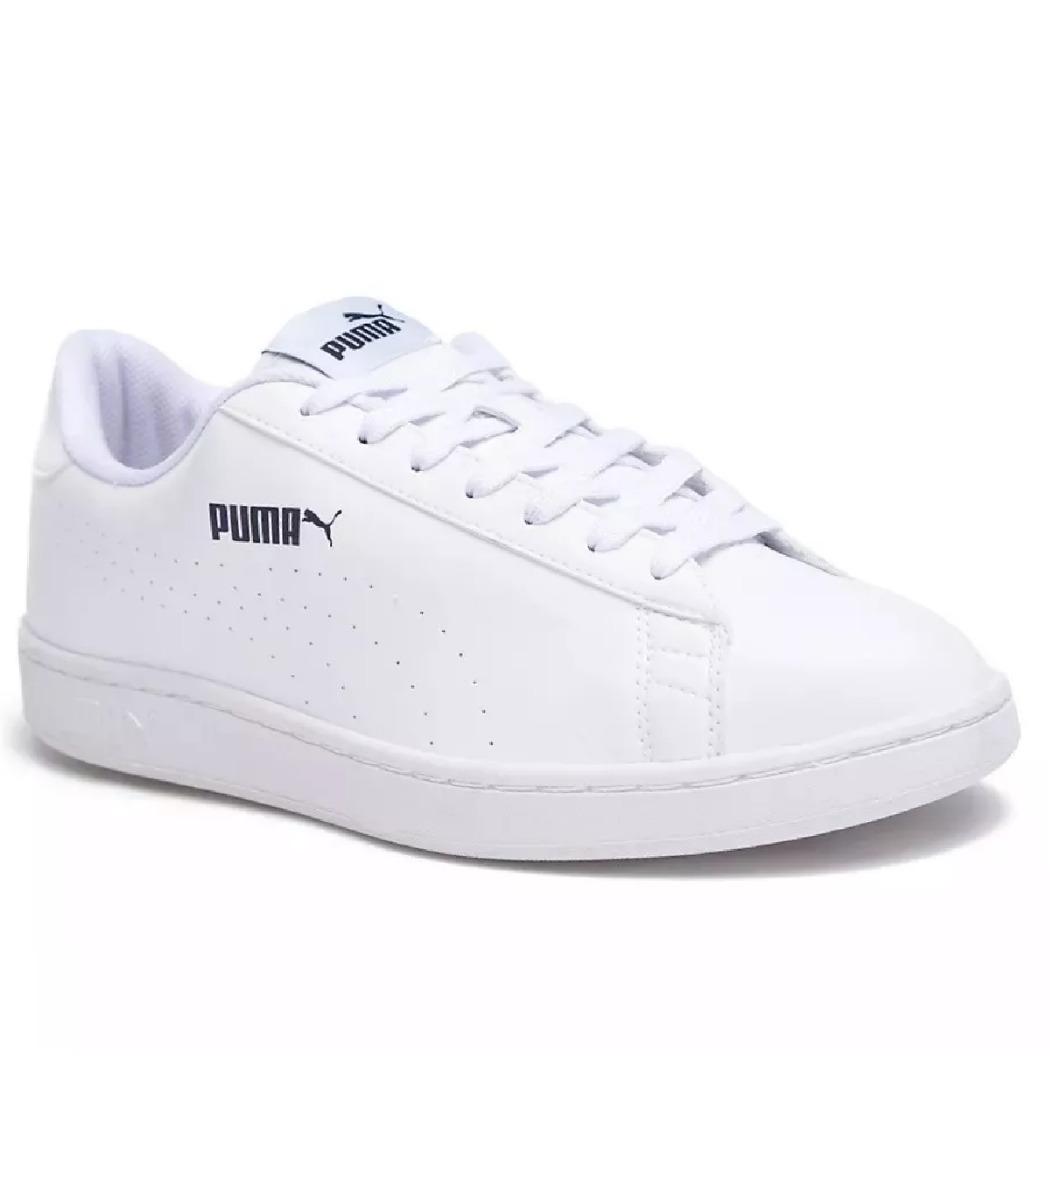 Zapatillas Puma Smash V2 L Perf Hombre - Blanco